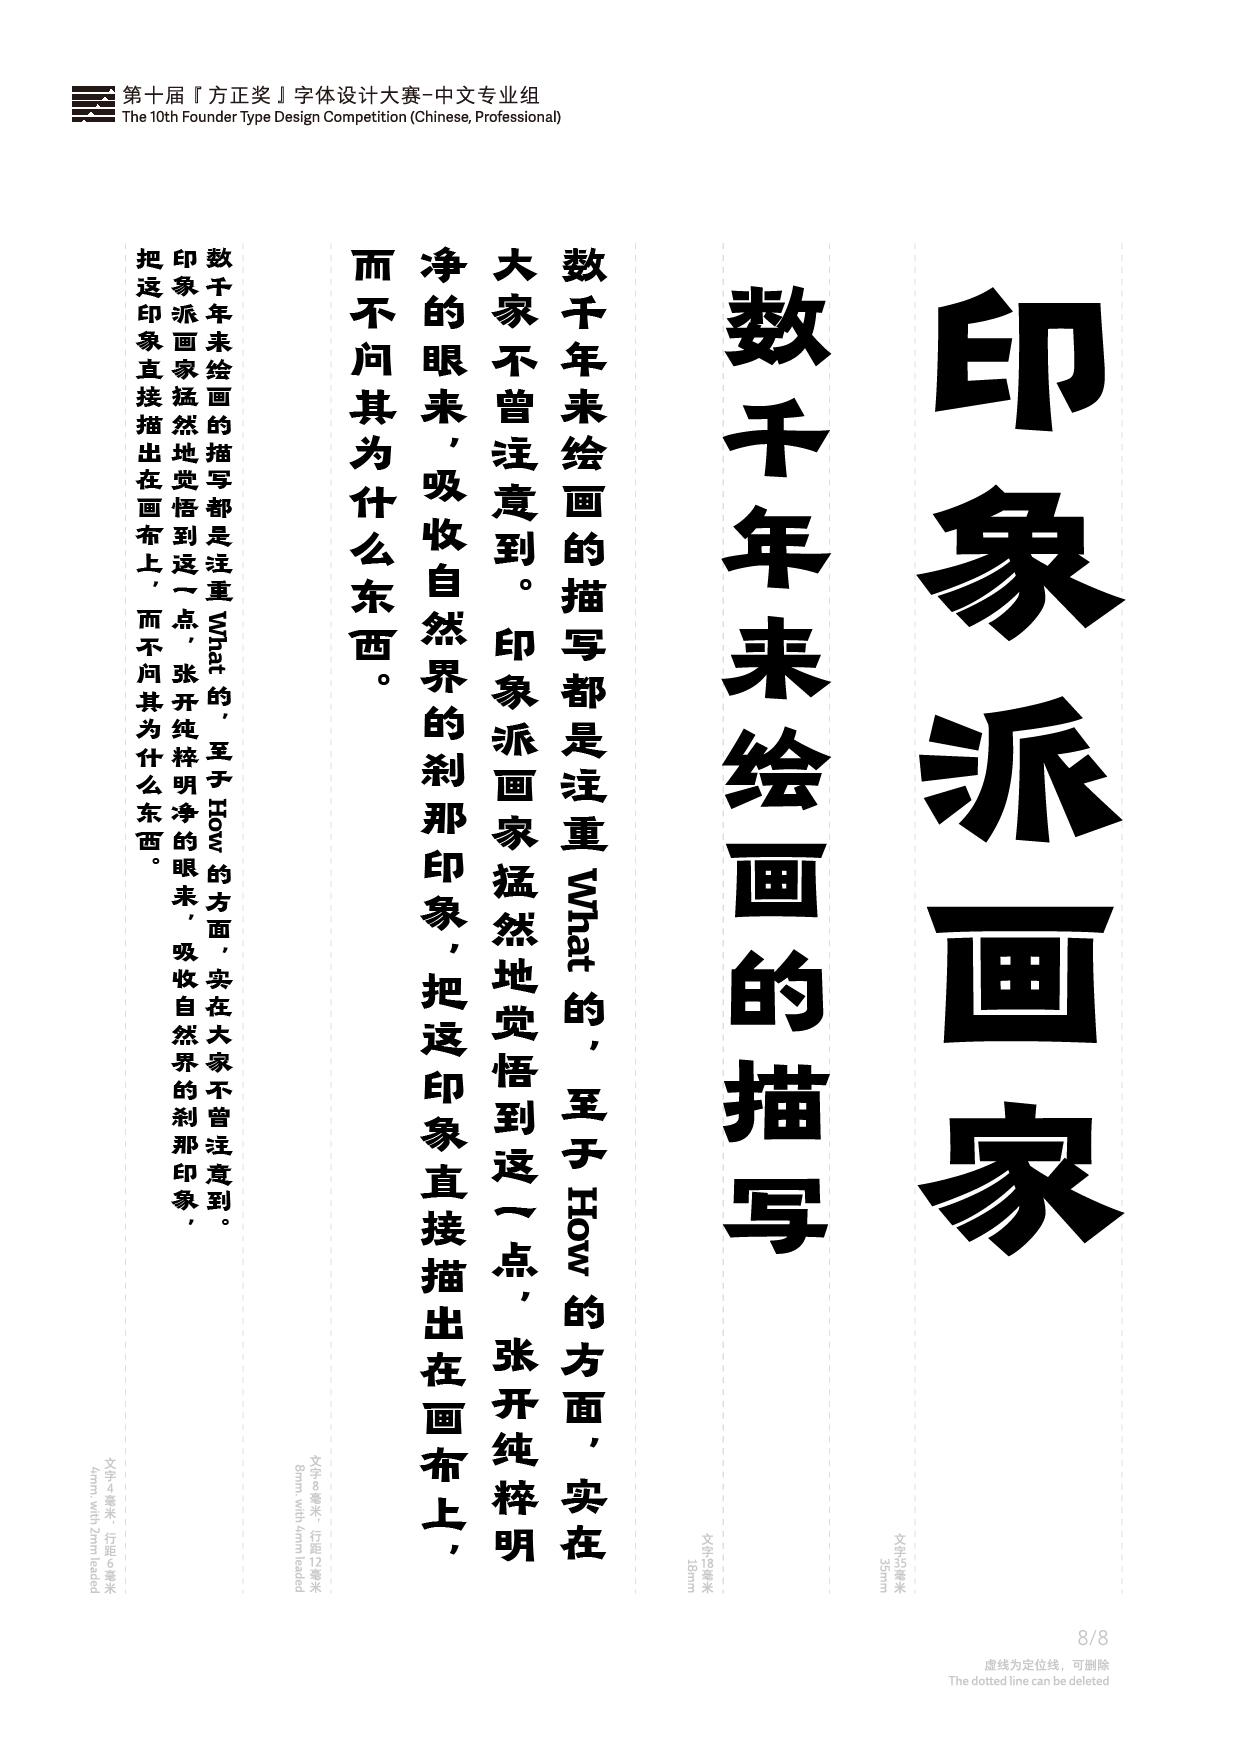 More than a dozen typesetting fonts